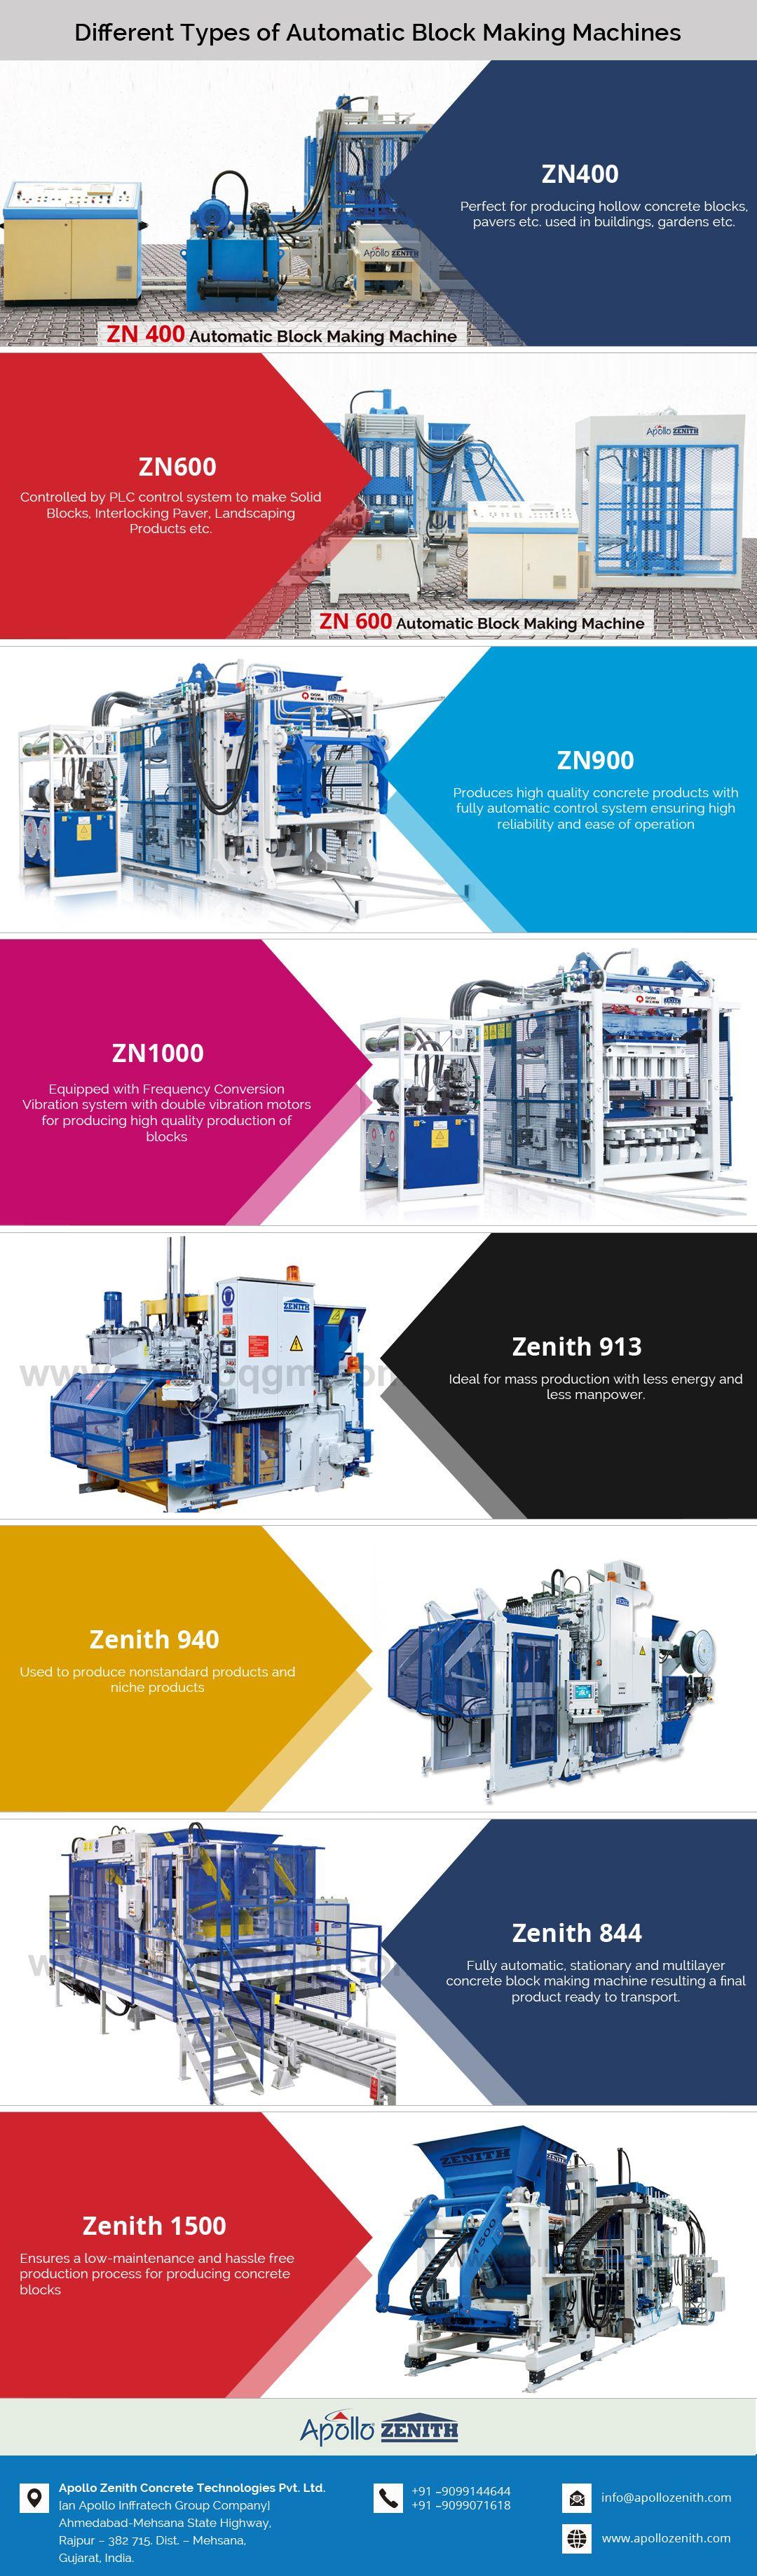 Apollo Zenith produces concrete block making machine and